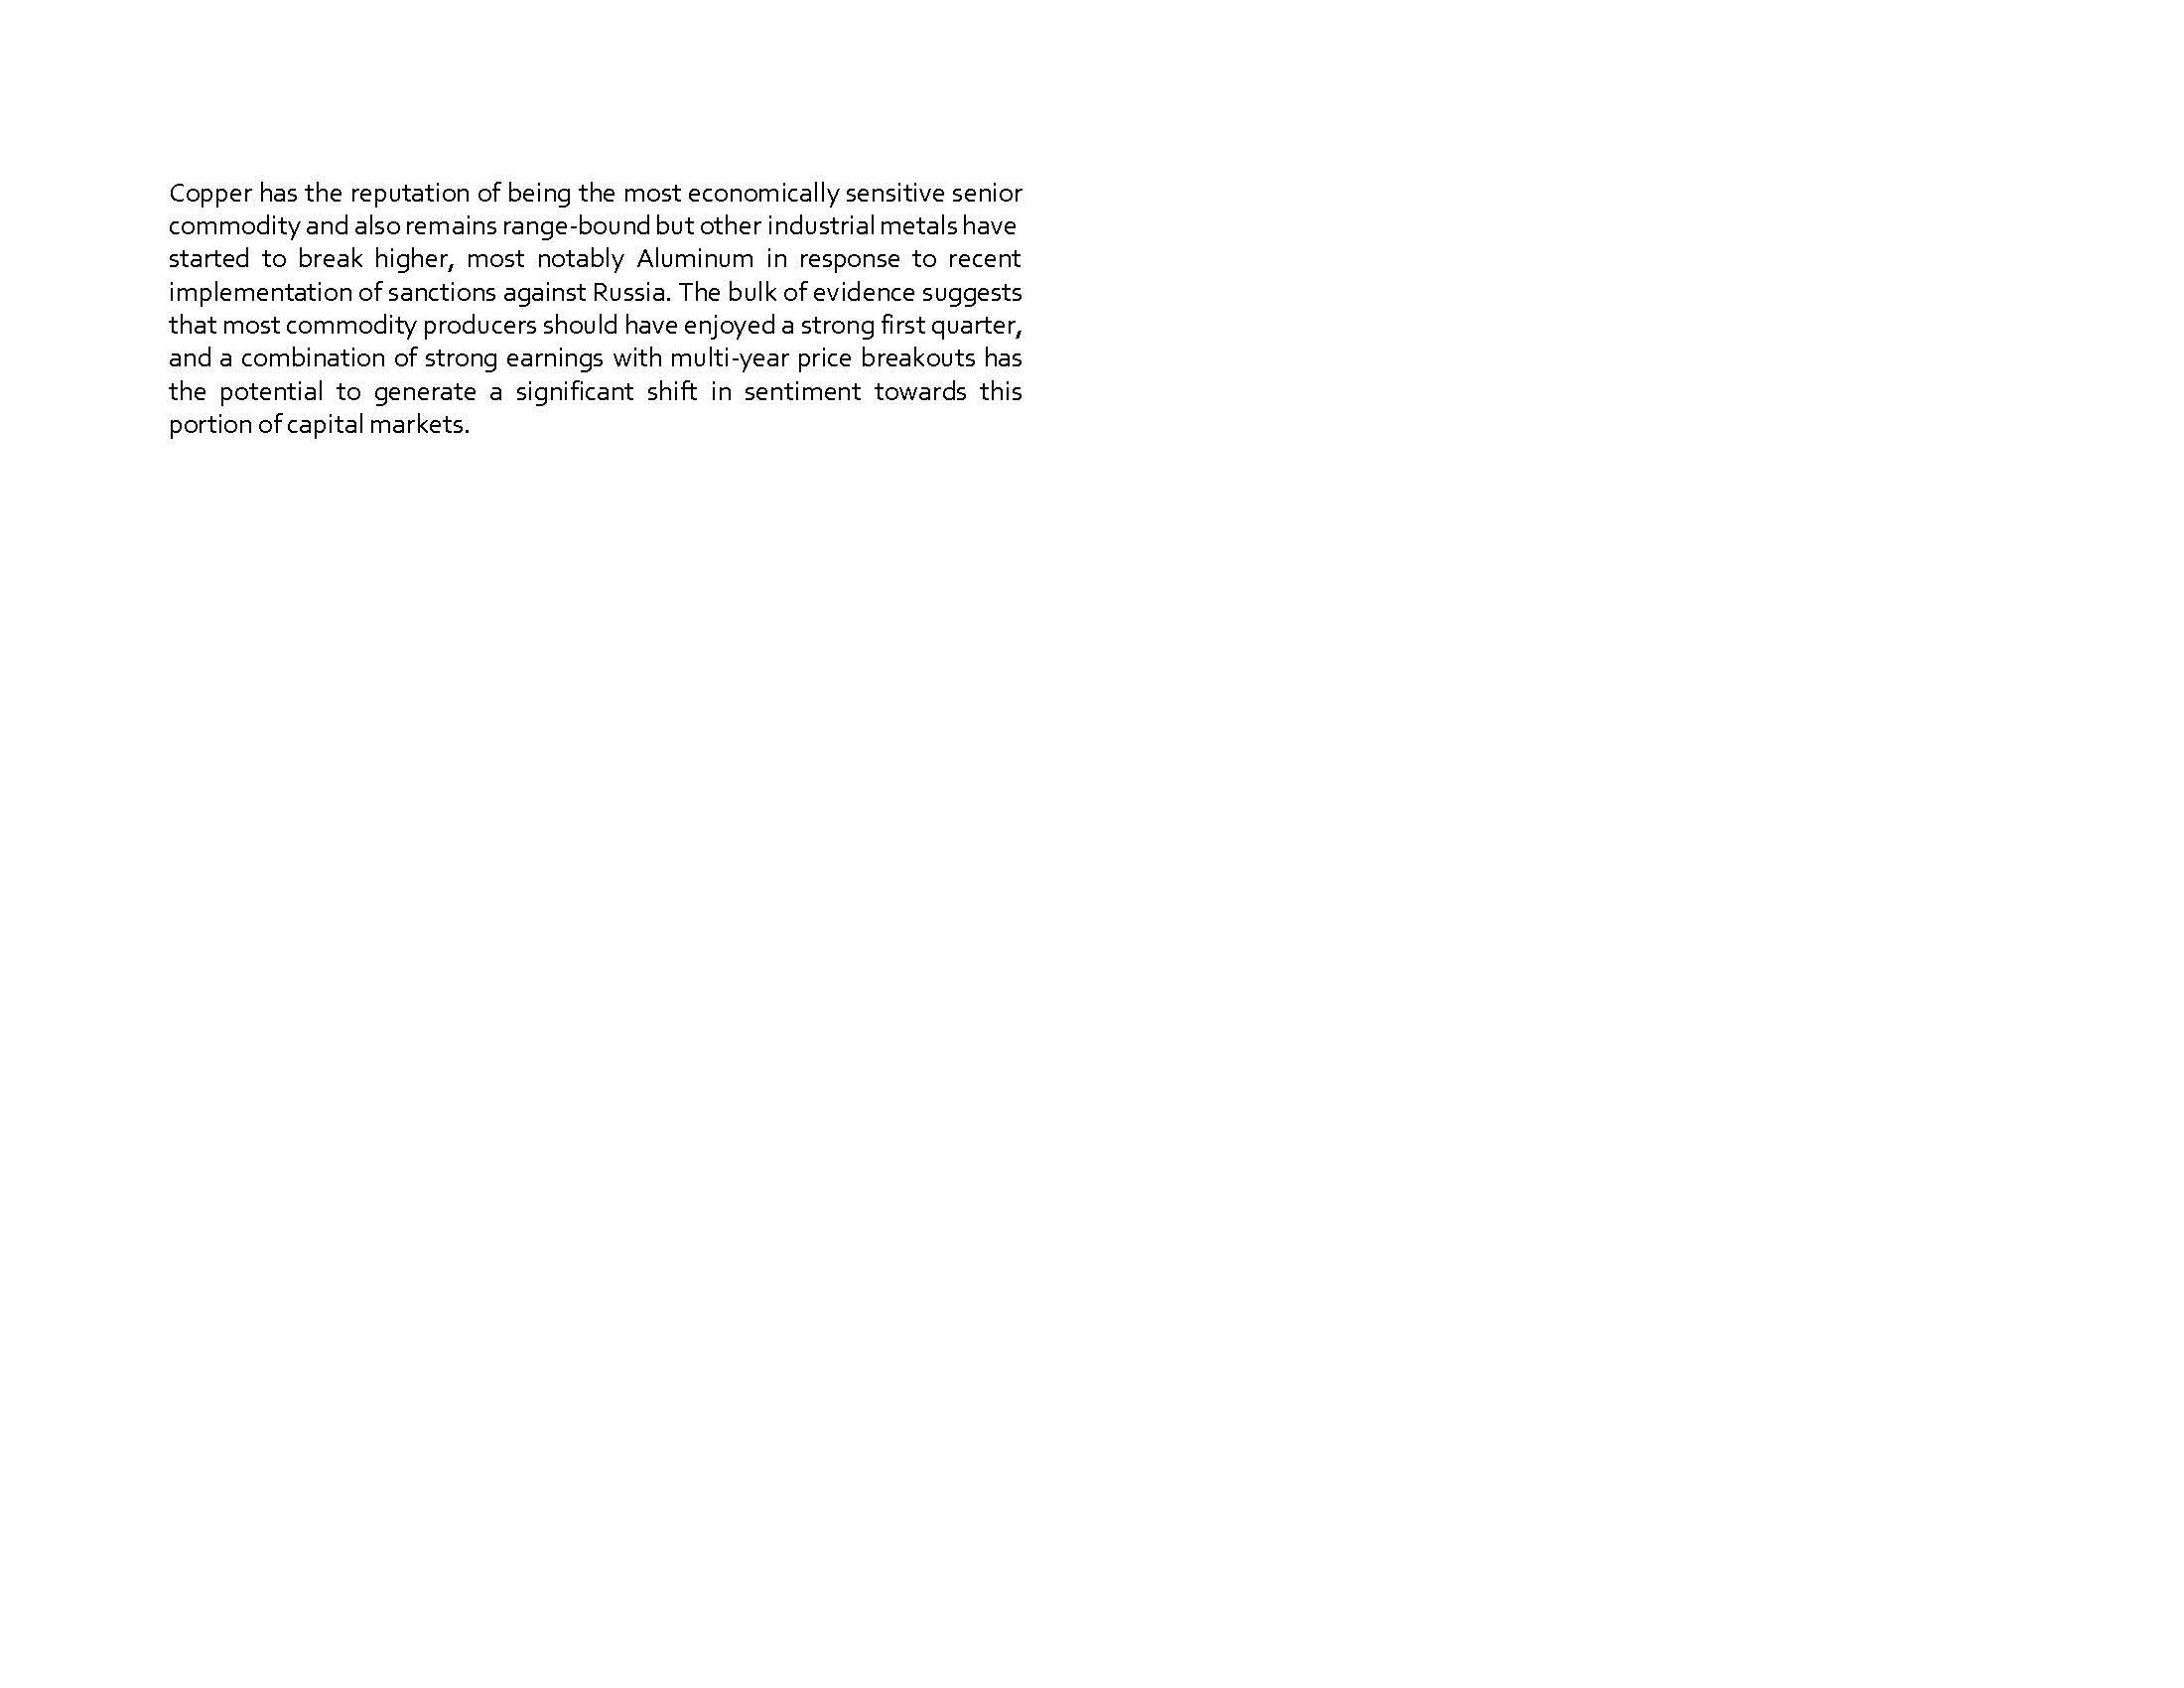 April 12_Marketfield Weekly Speculator_Page_03.jpg